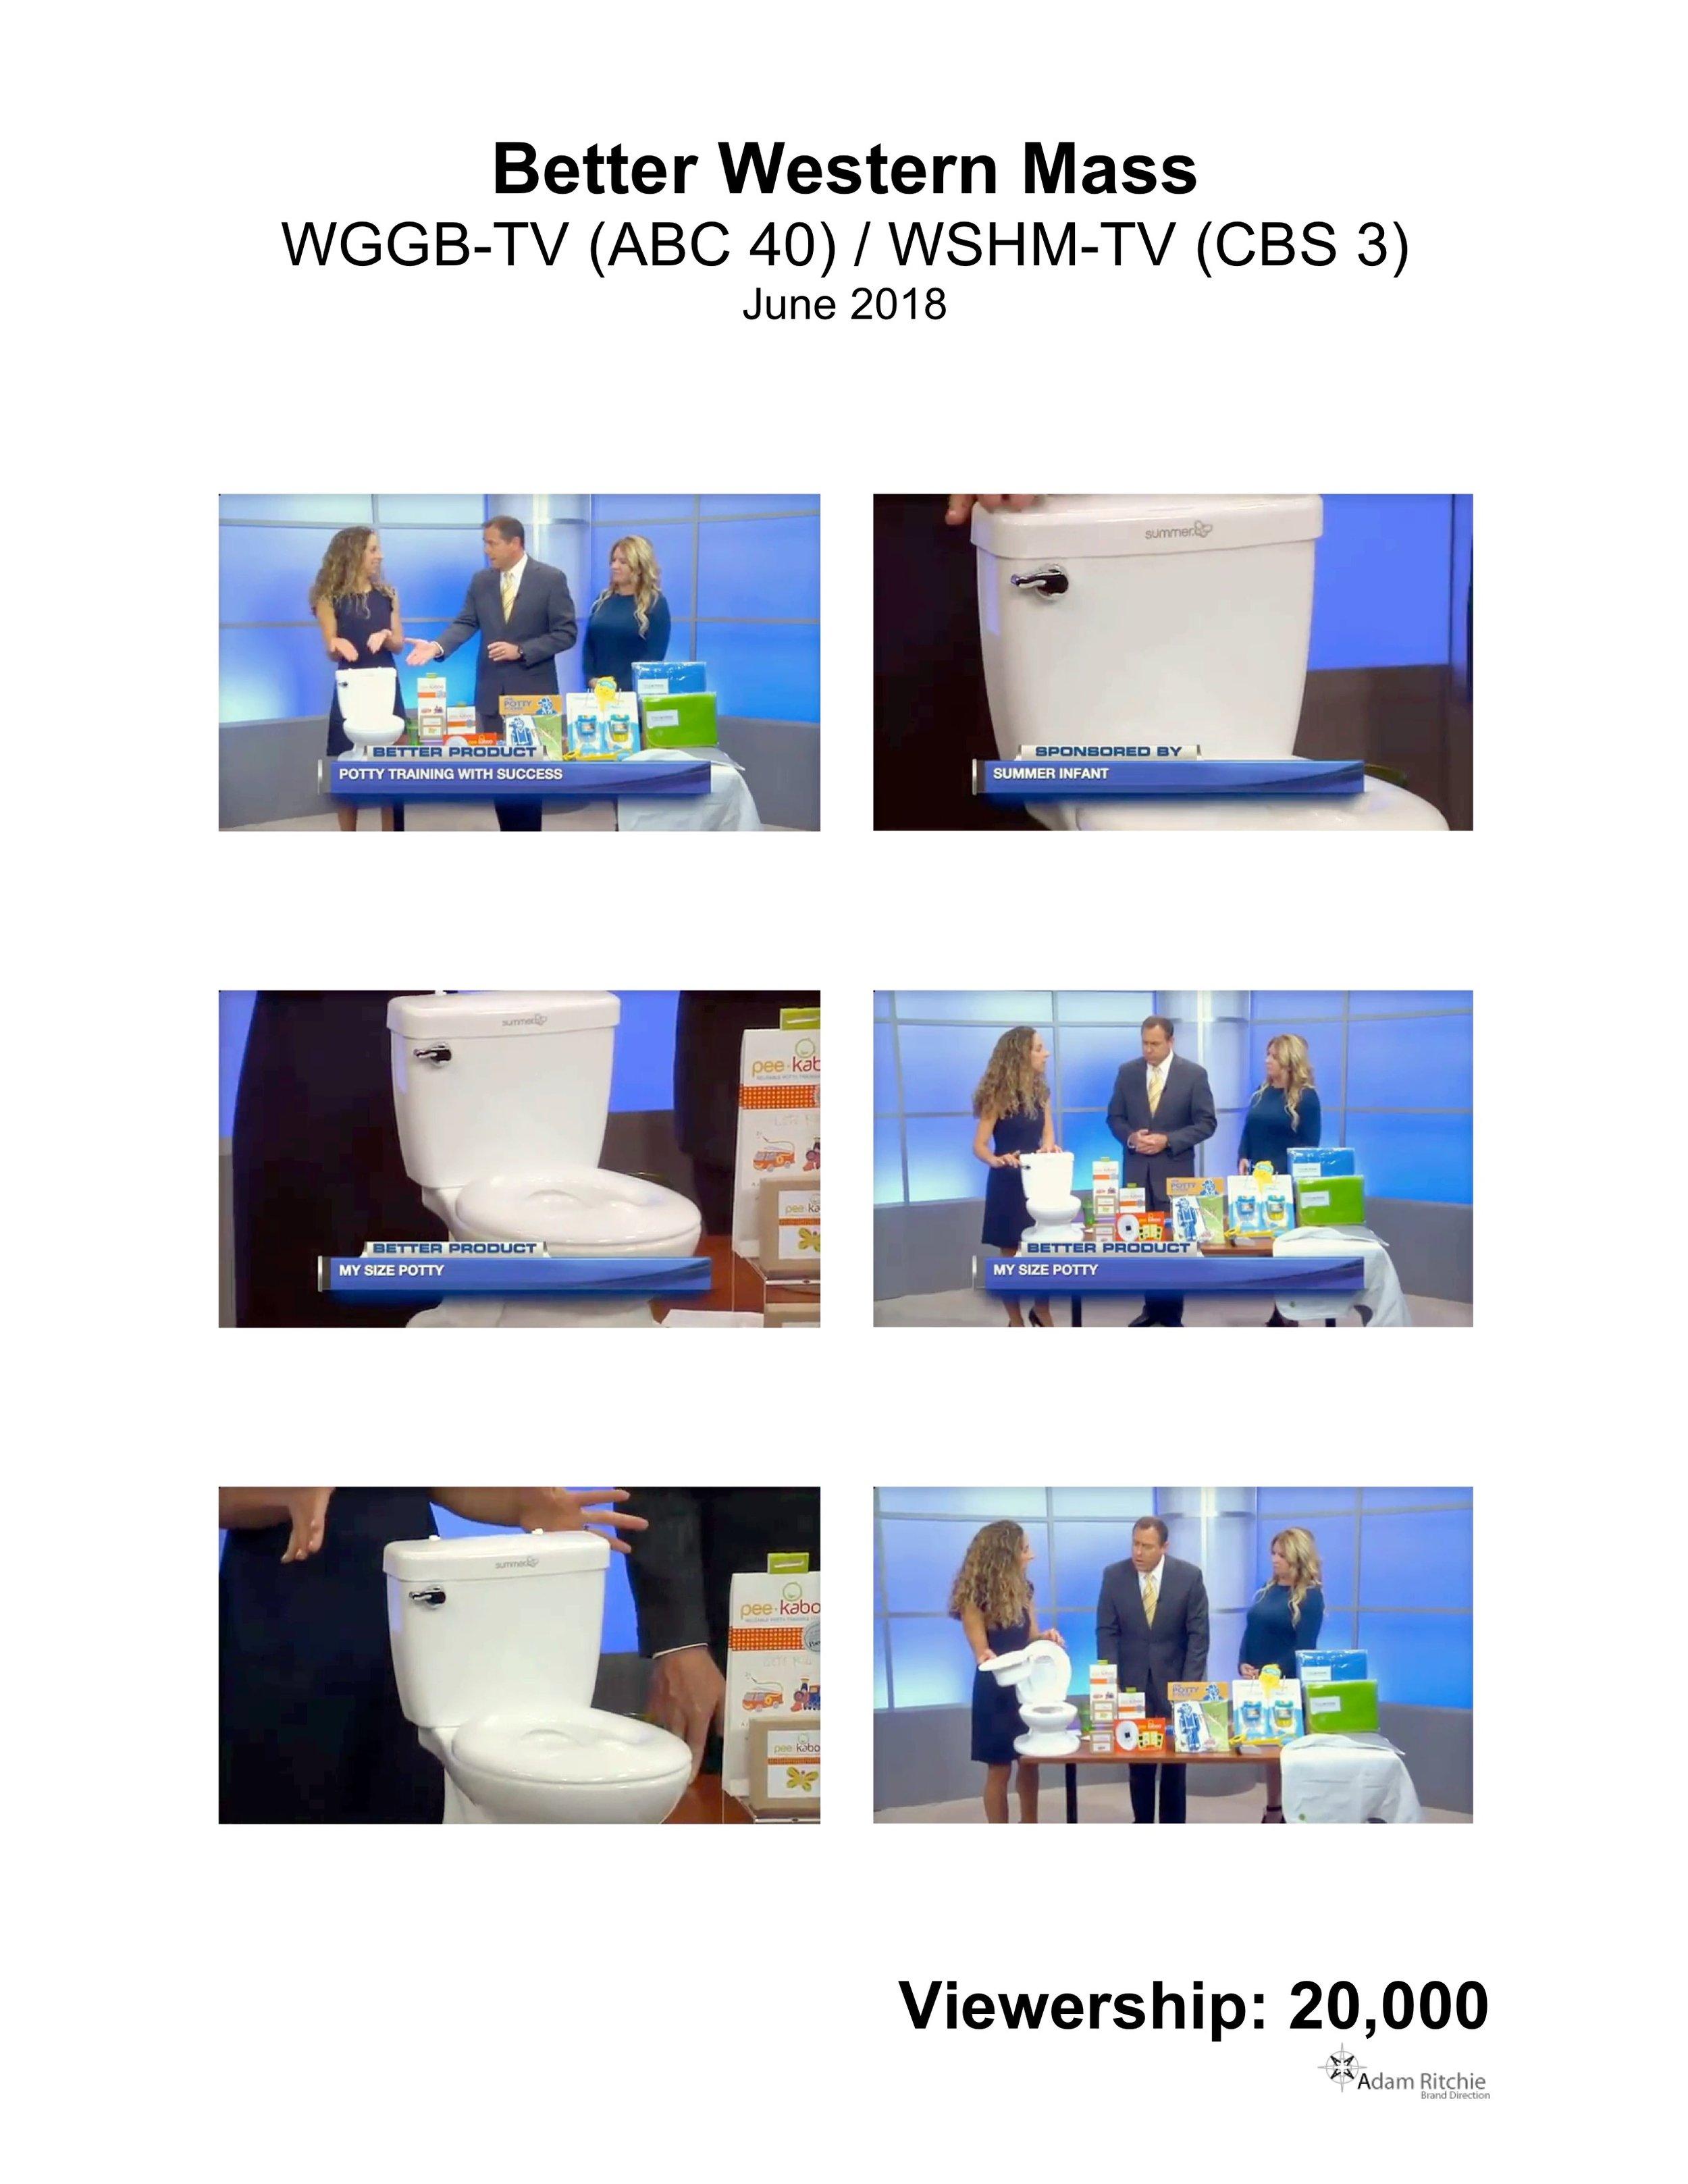 2018.06.18_WGGB-TV (ABC 40) - WSHM-TV (CBS 3)_Summer Infant My Size Potty.jpeg